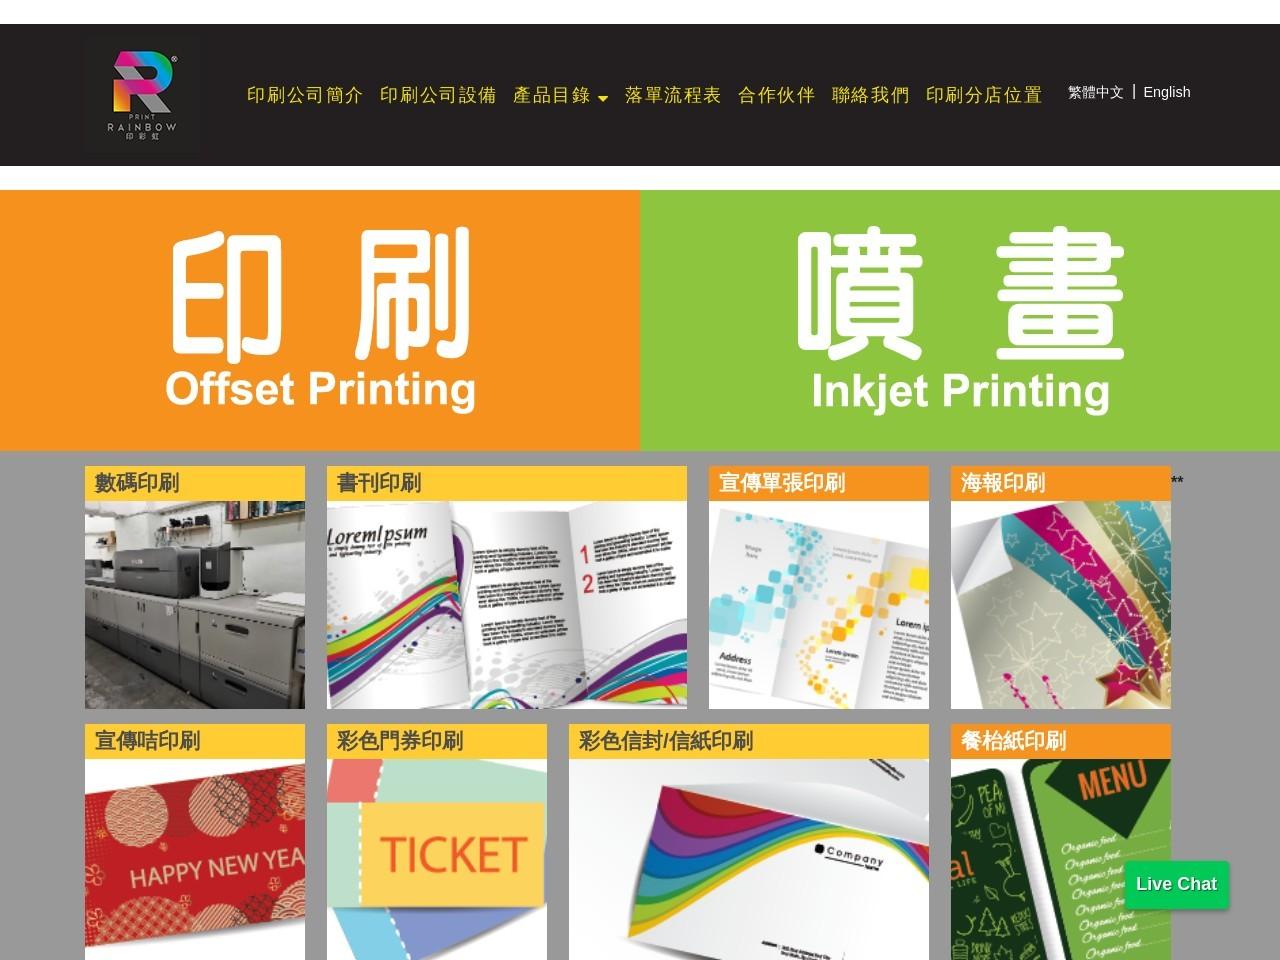 PrintRainbow印彩虹香港印刷公司截图